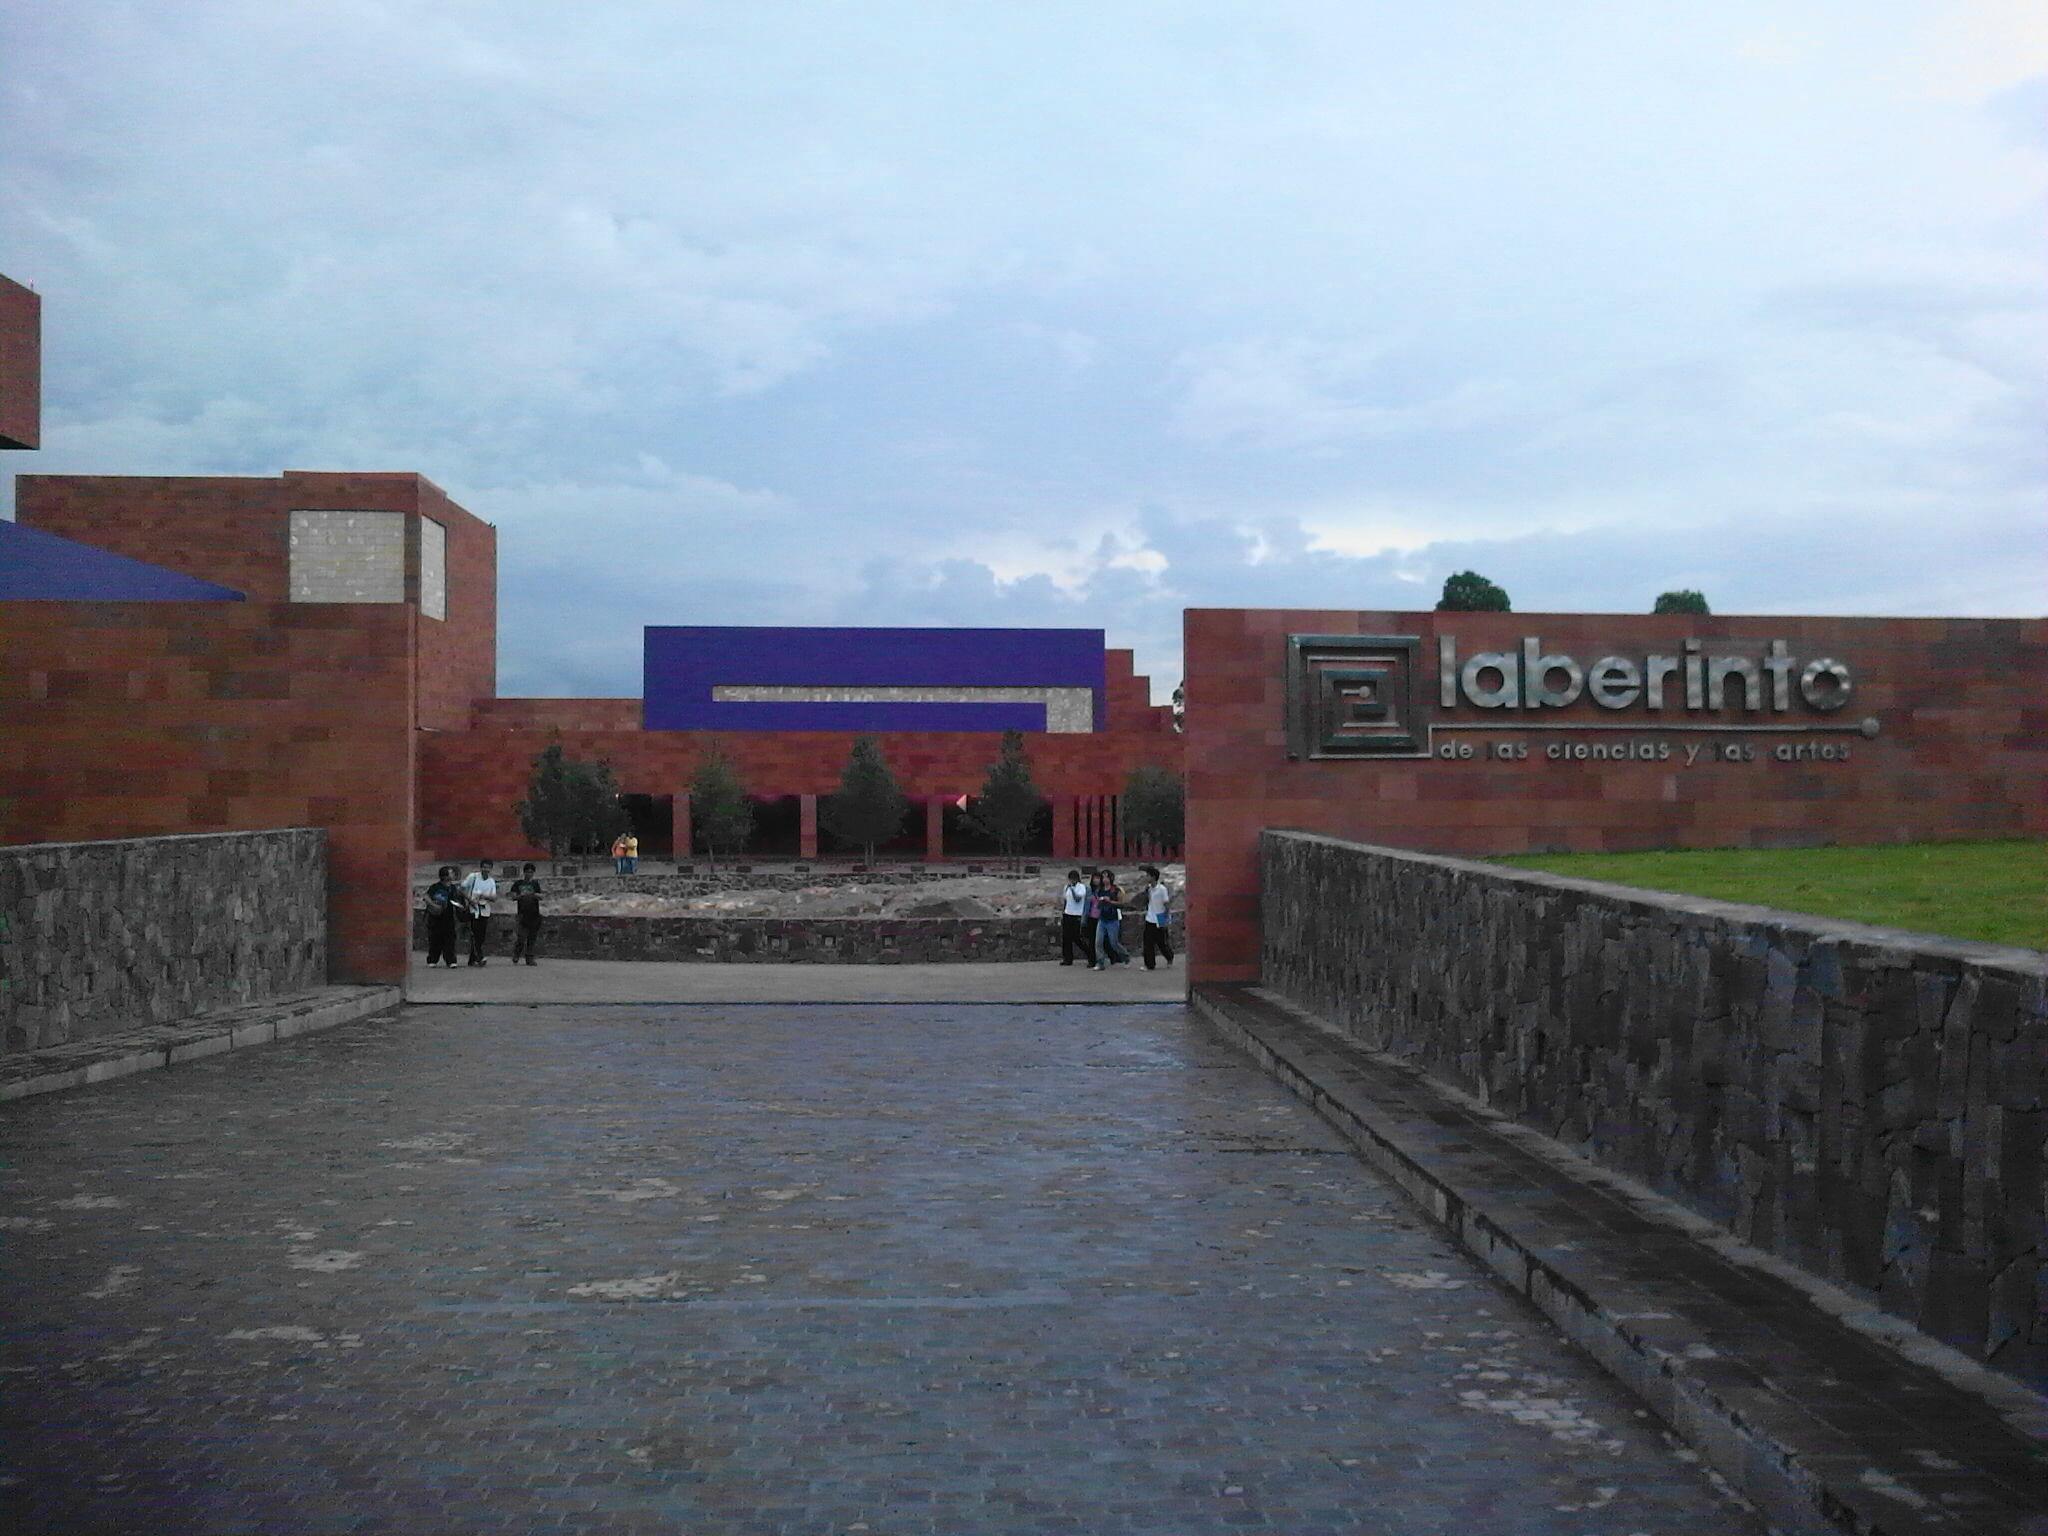 10 museos de México que deberías conocer si viajas a ese país 2